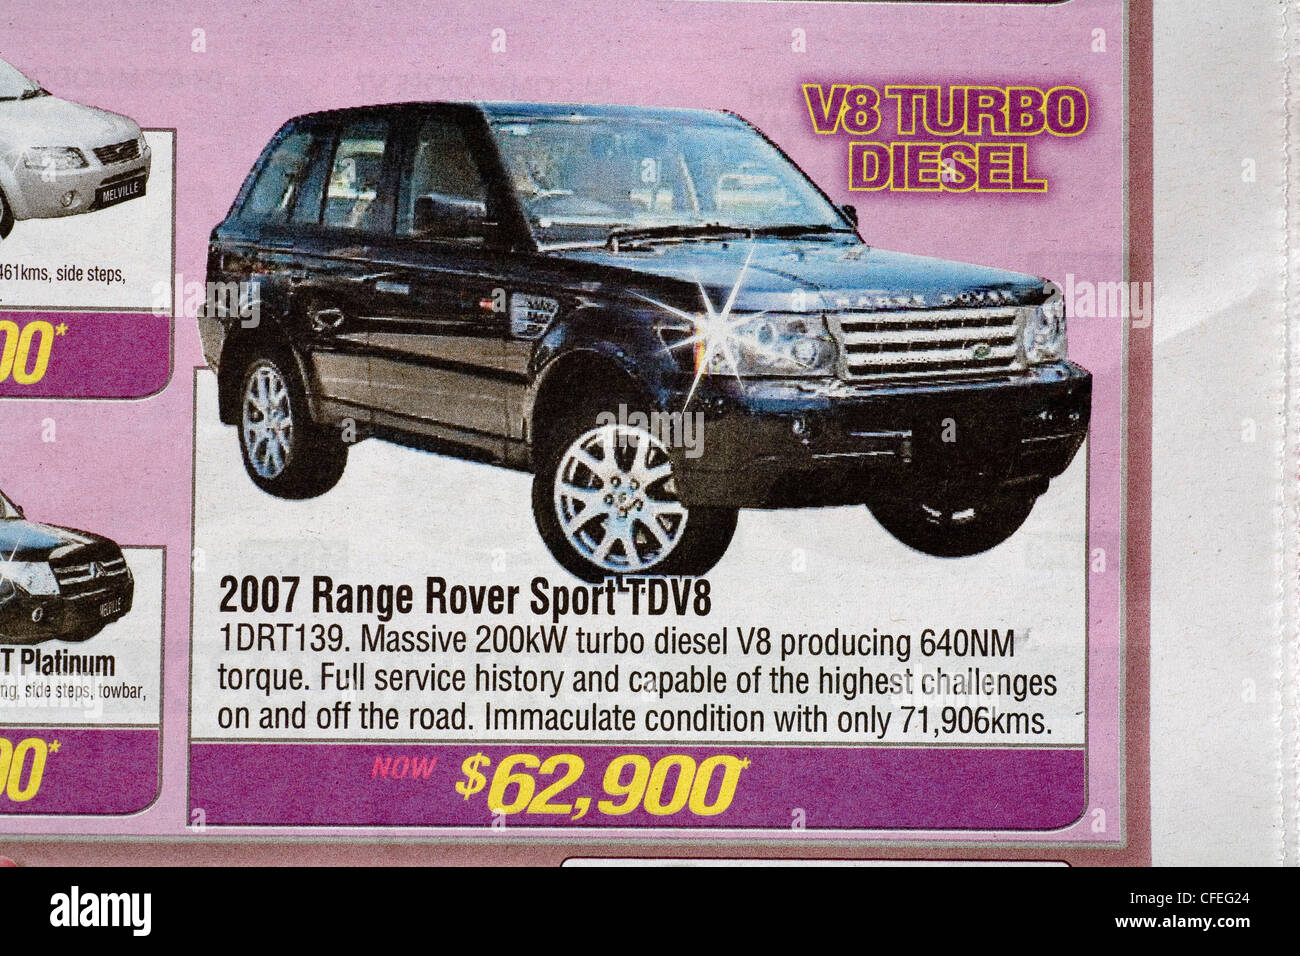 used car advert advertisement